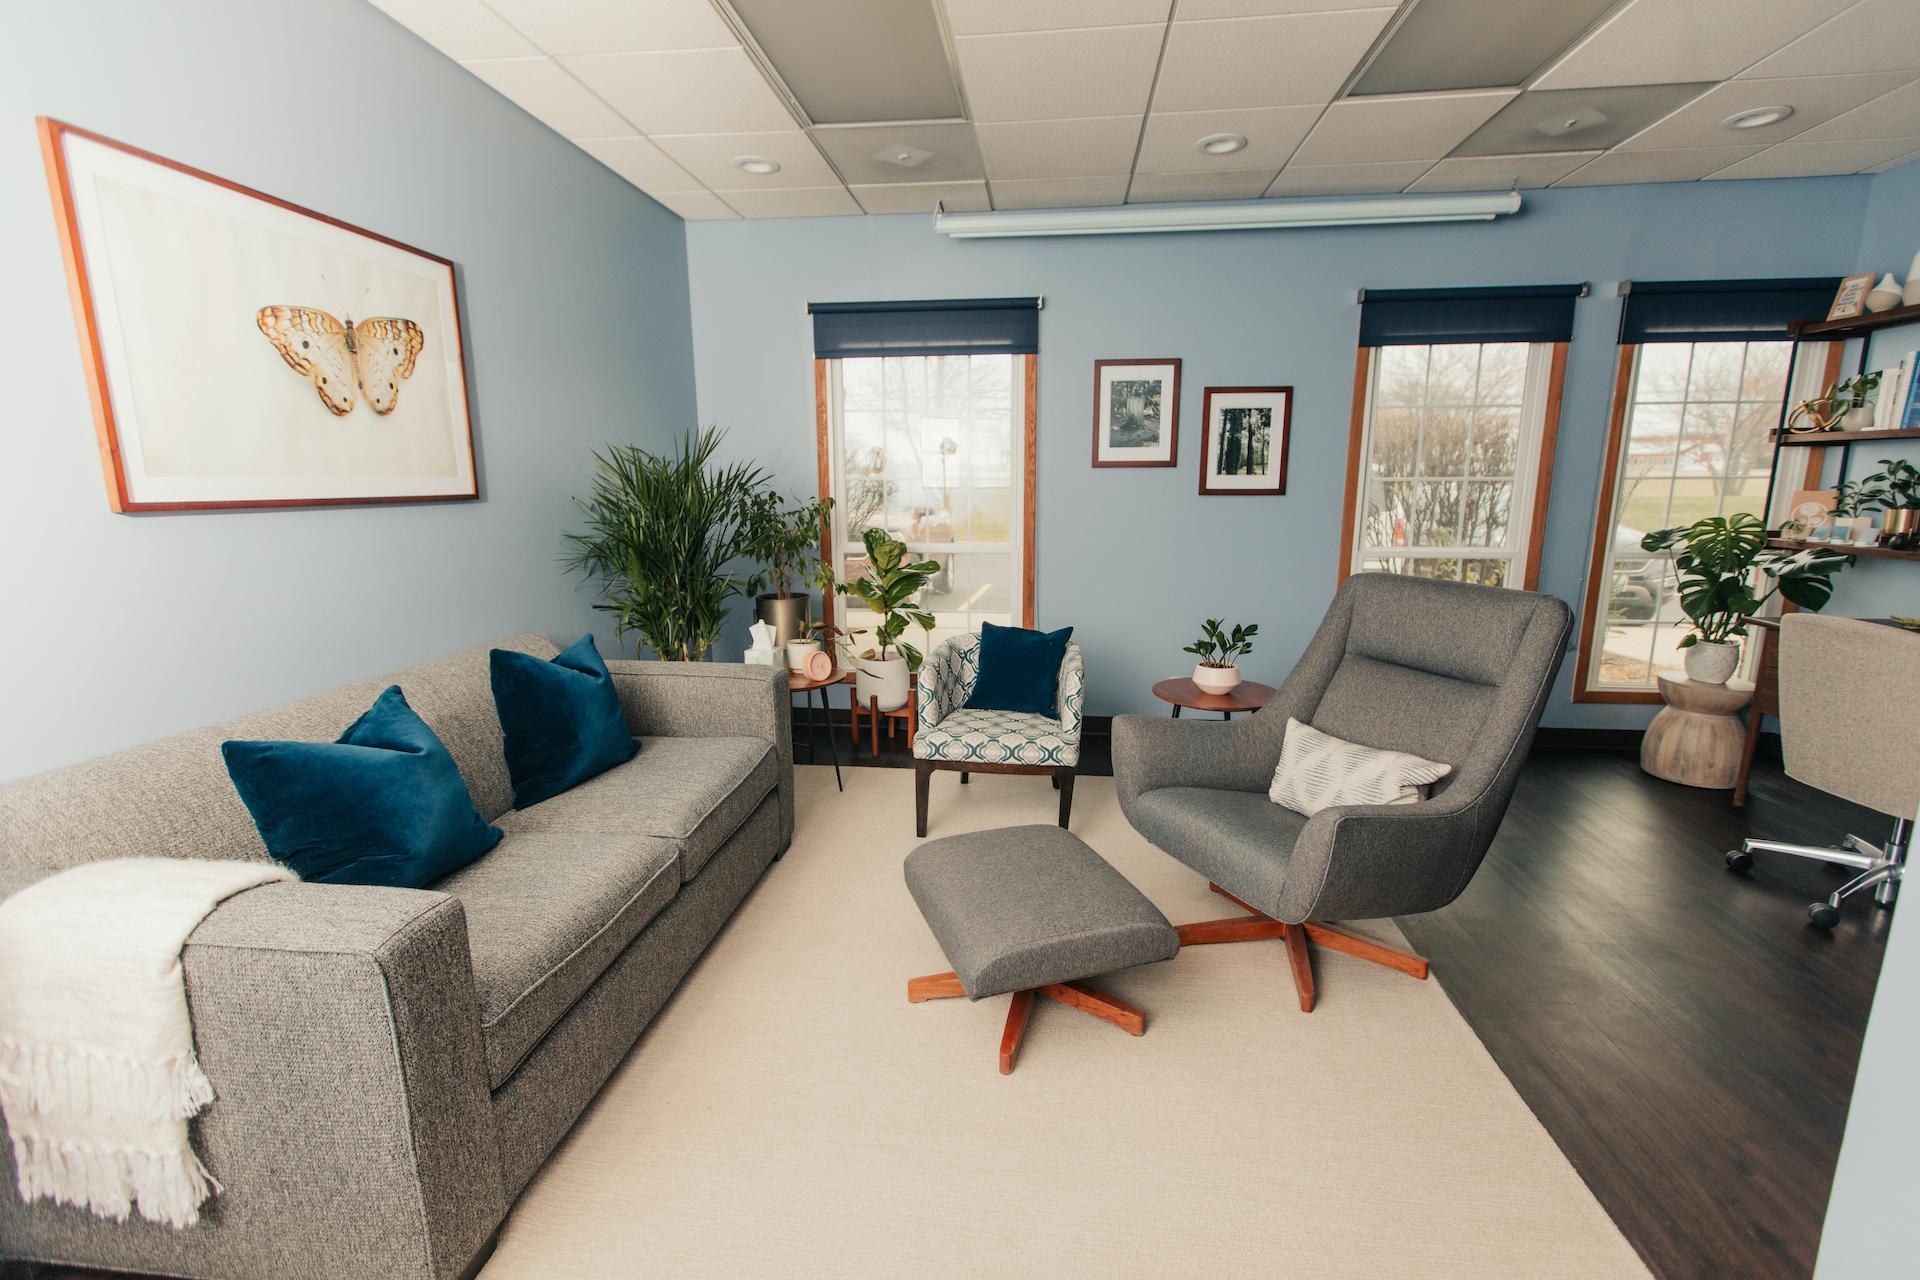 South Barrington Therapist Office